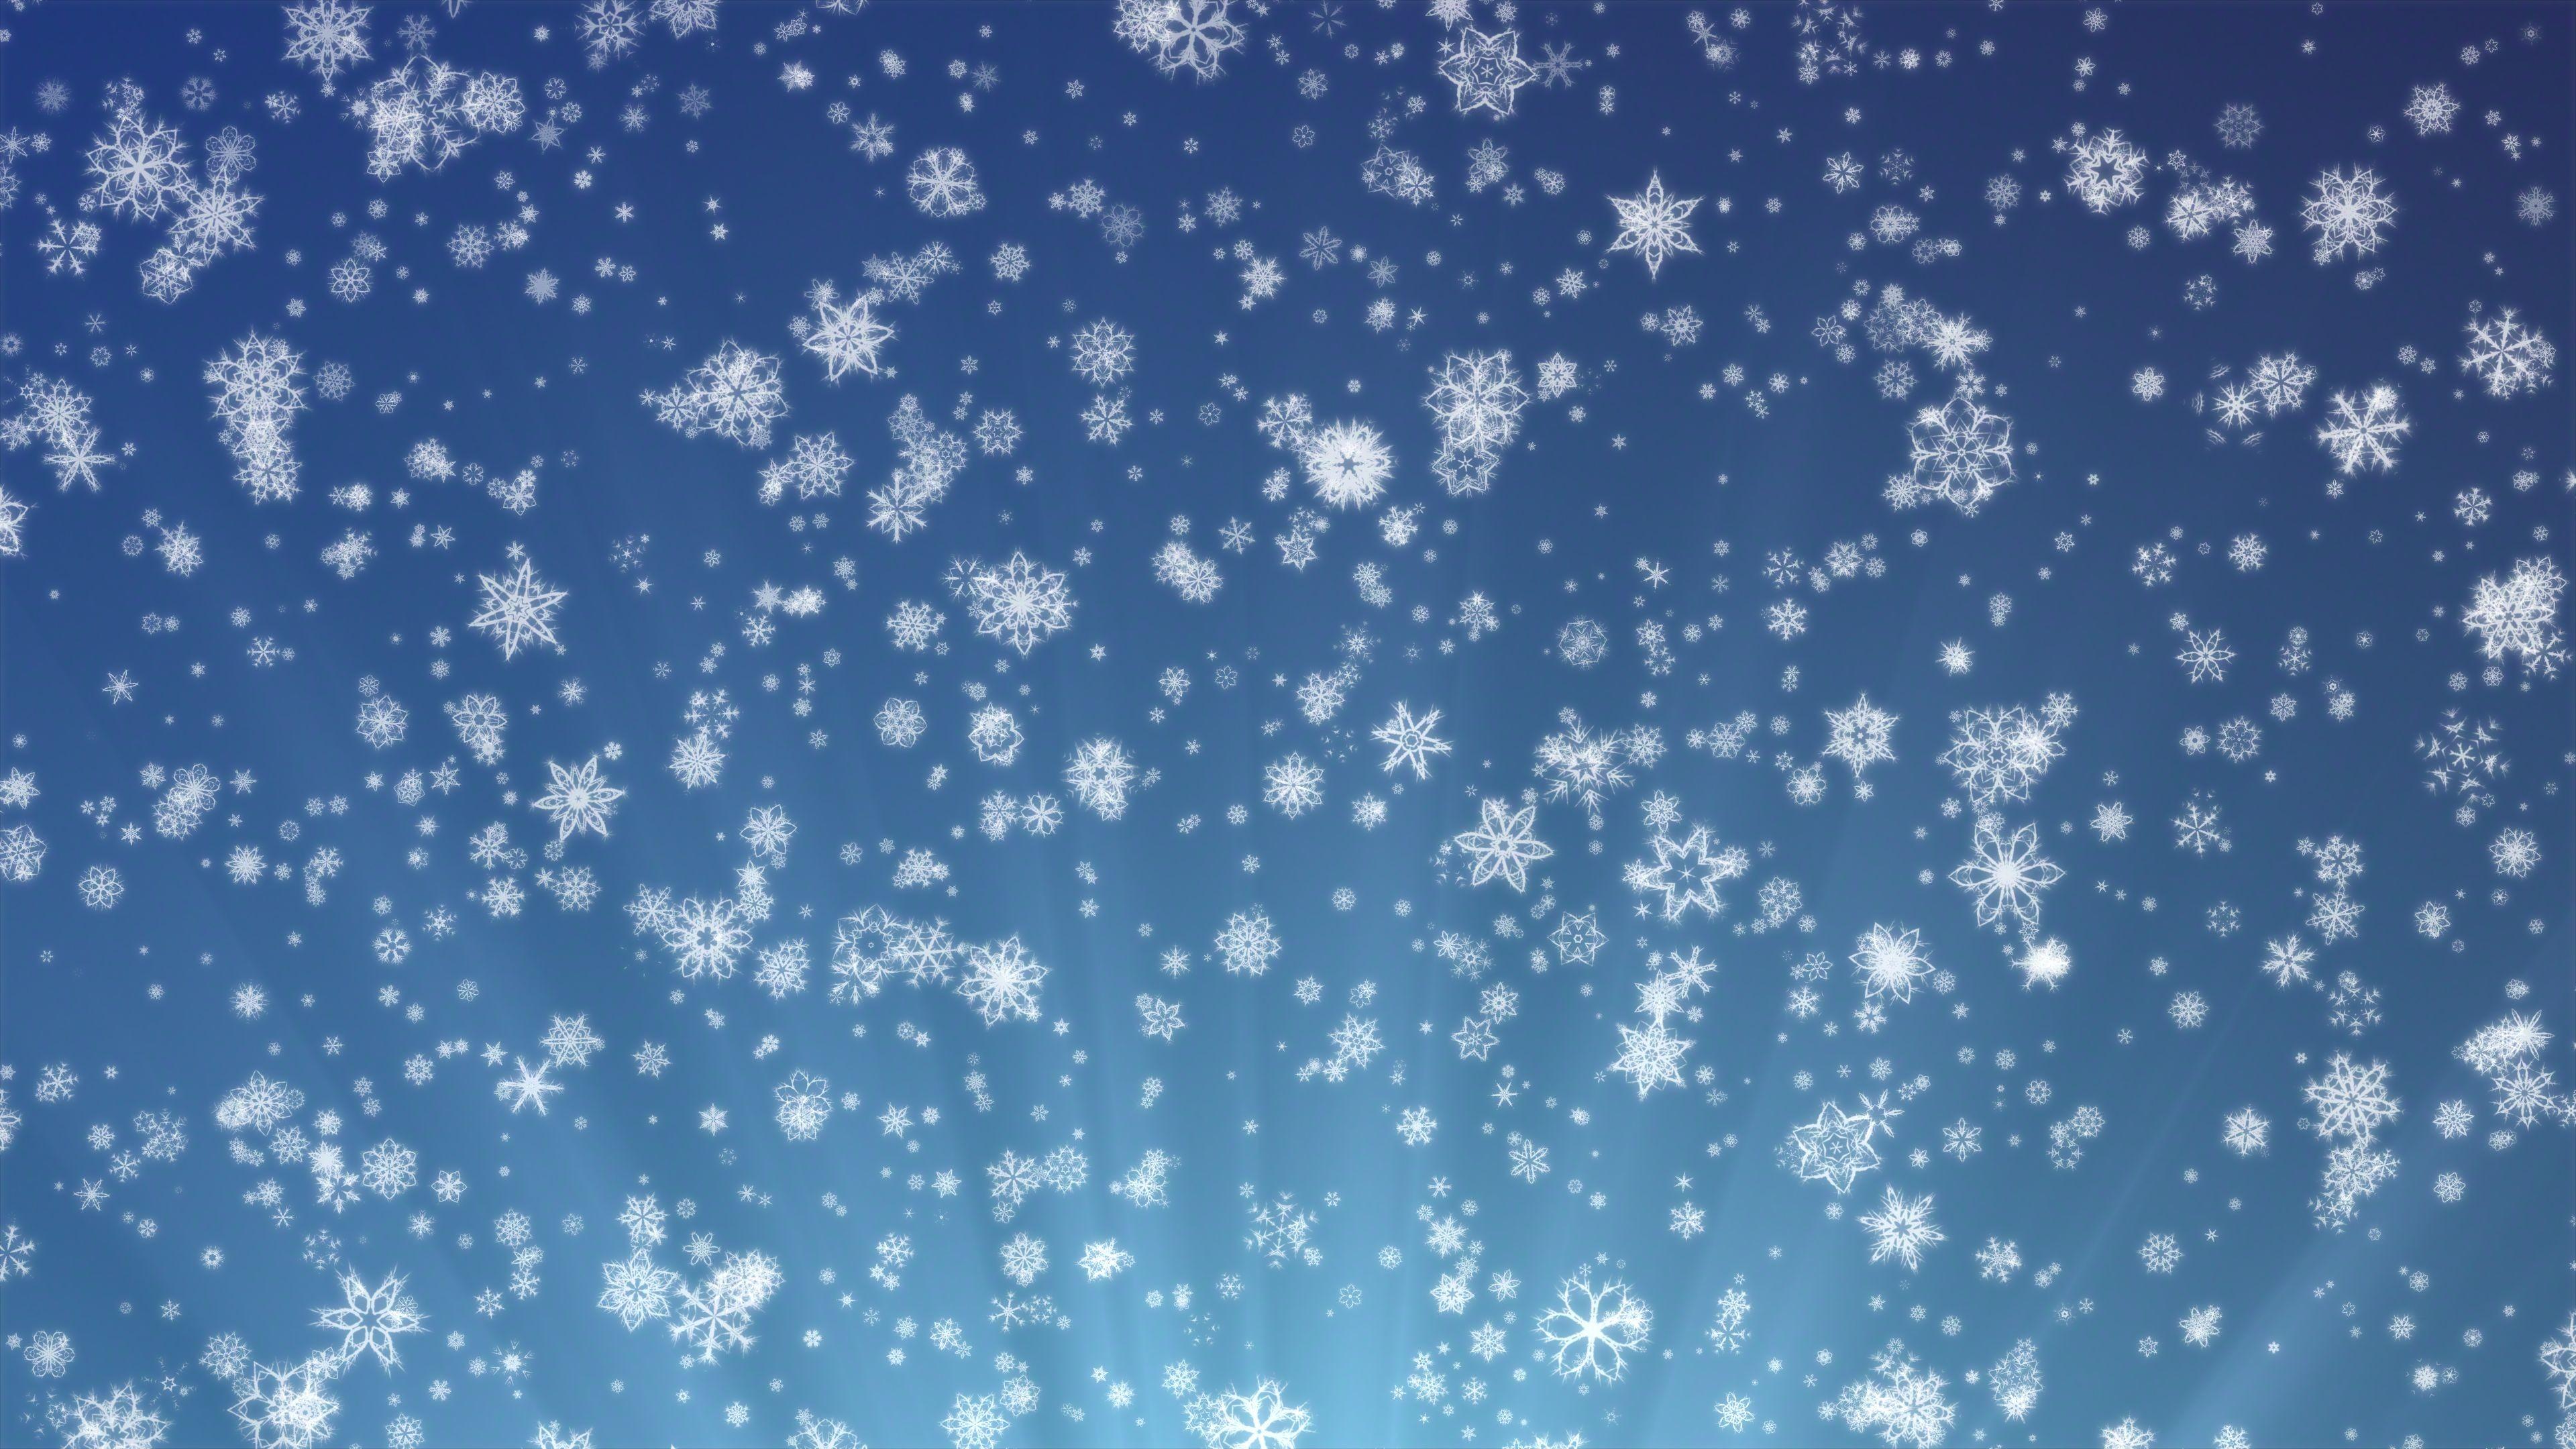 Картинки снега для фона